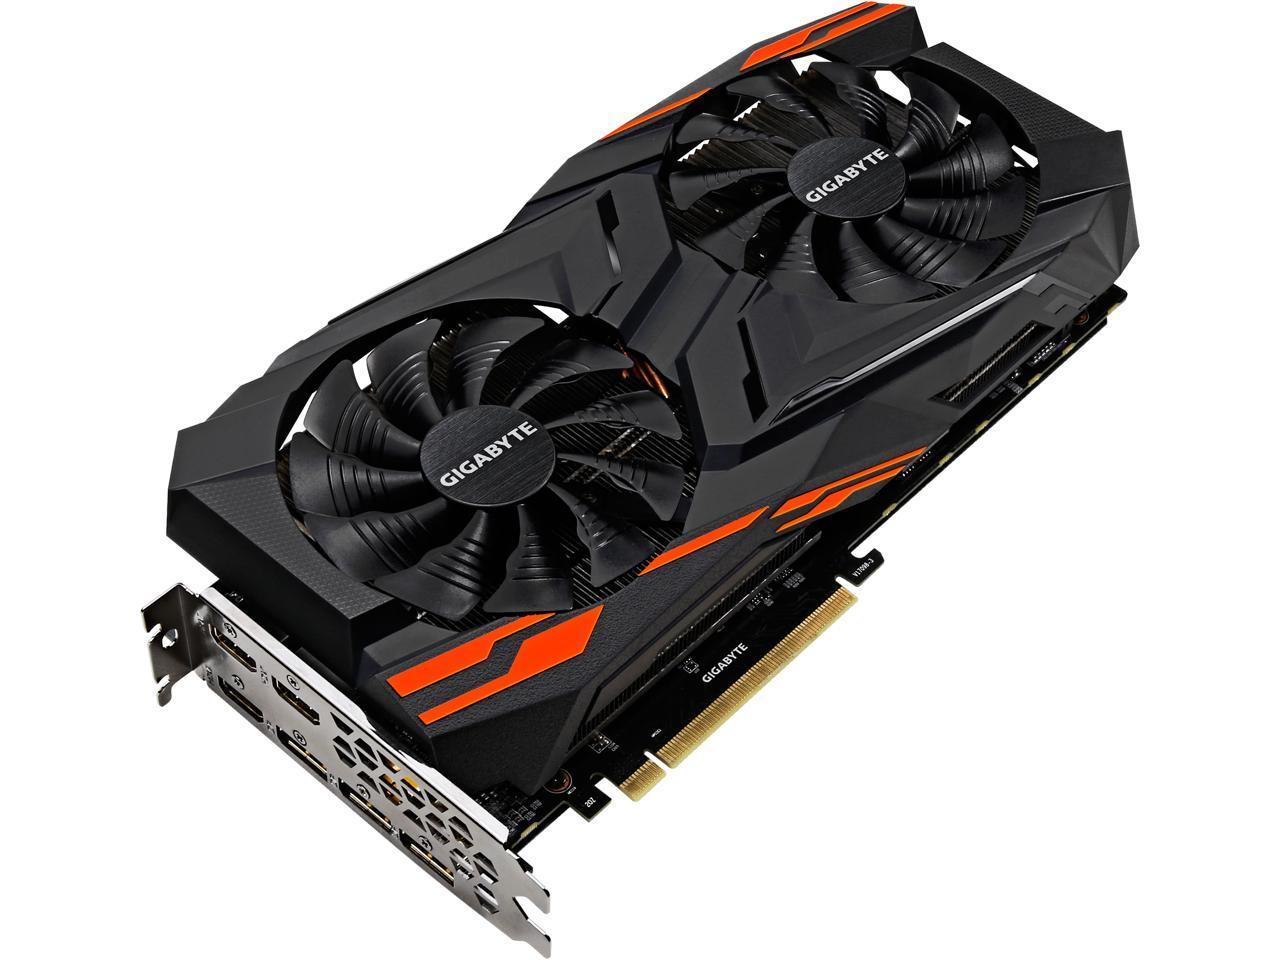 Details about GIGABYTE Radeon RX Vega 64 DirectX 12 GV-RXVEGA64GAMING  OC-8GD 8GB 2048-Bit HBM2